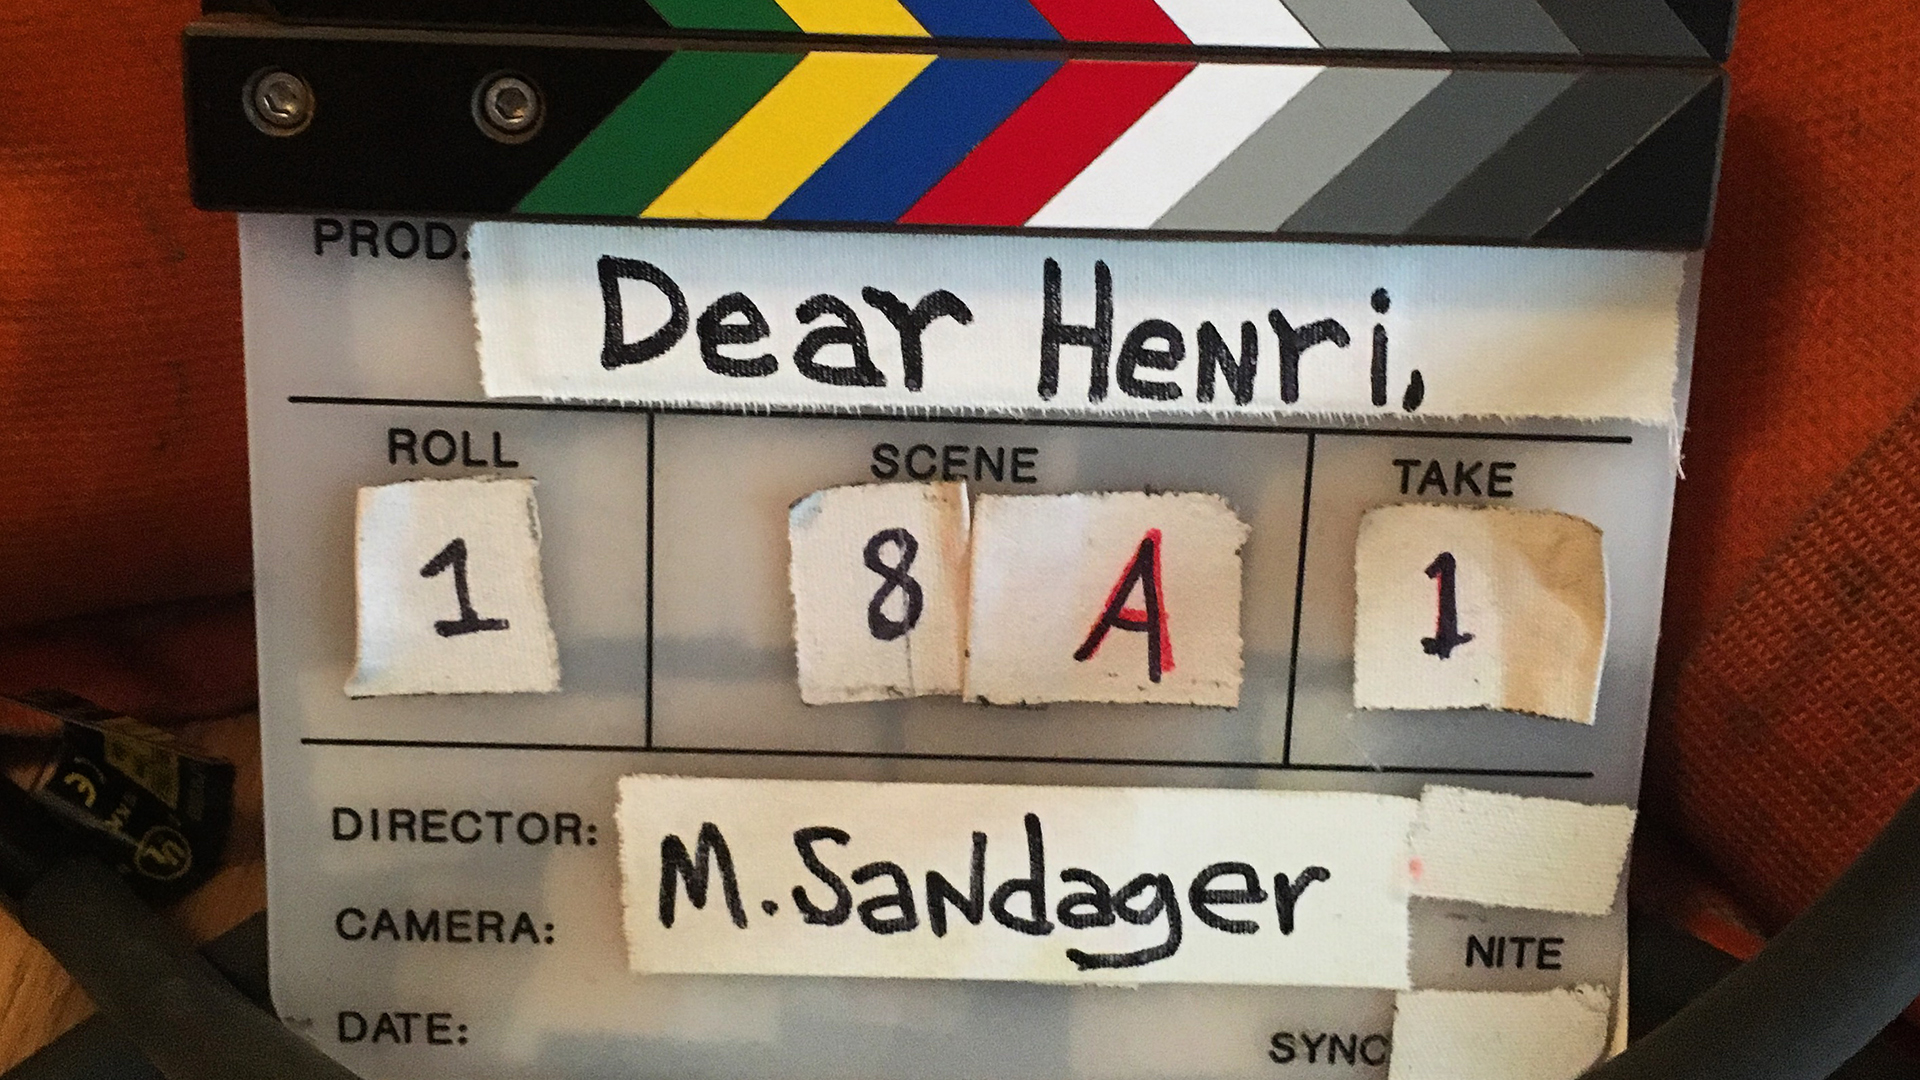 Dear_Henri_BTS_06.jpg